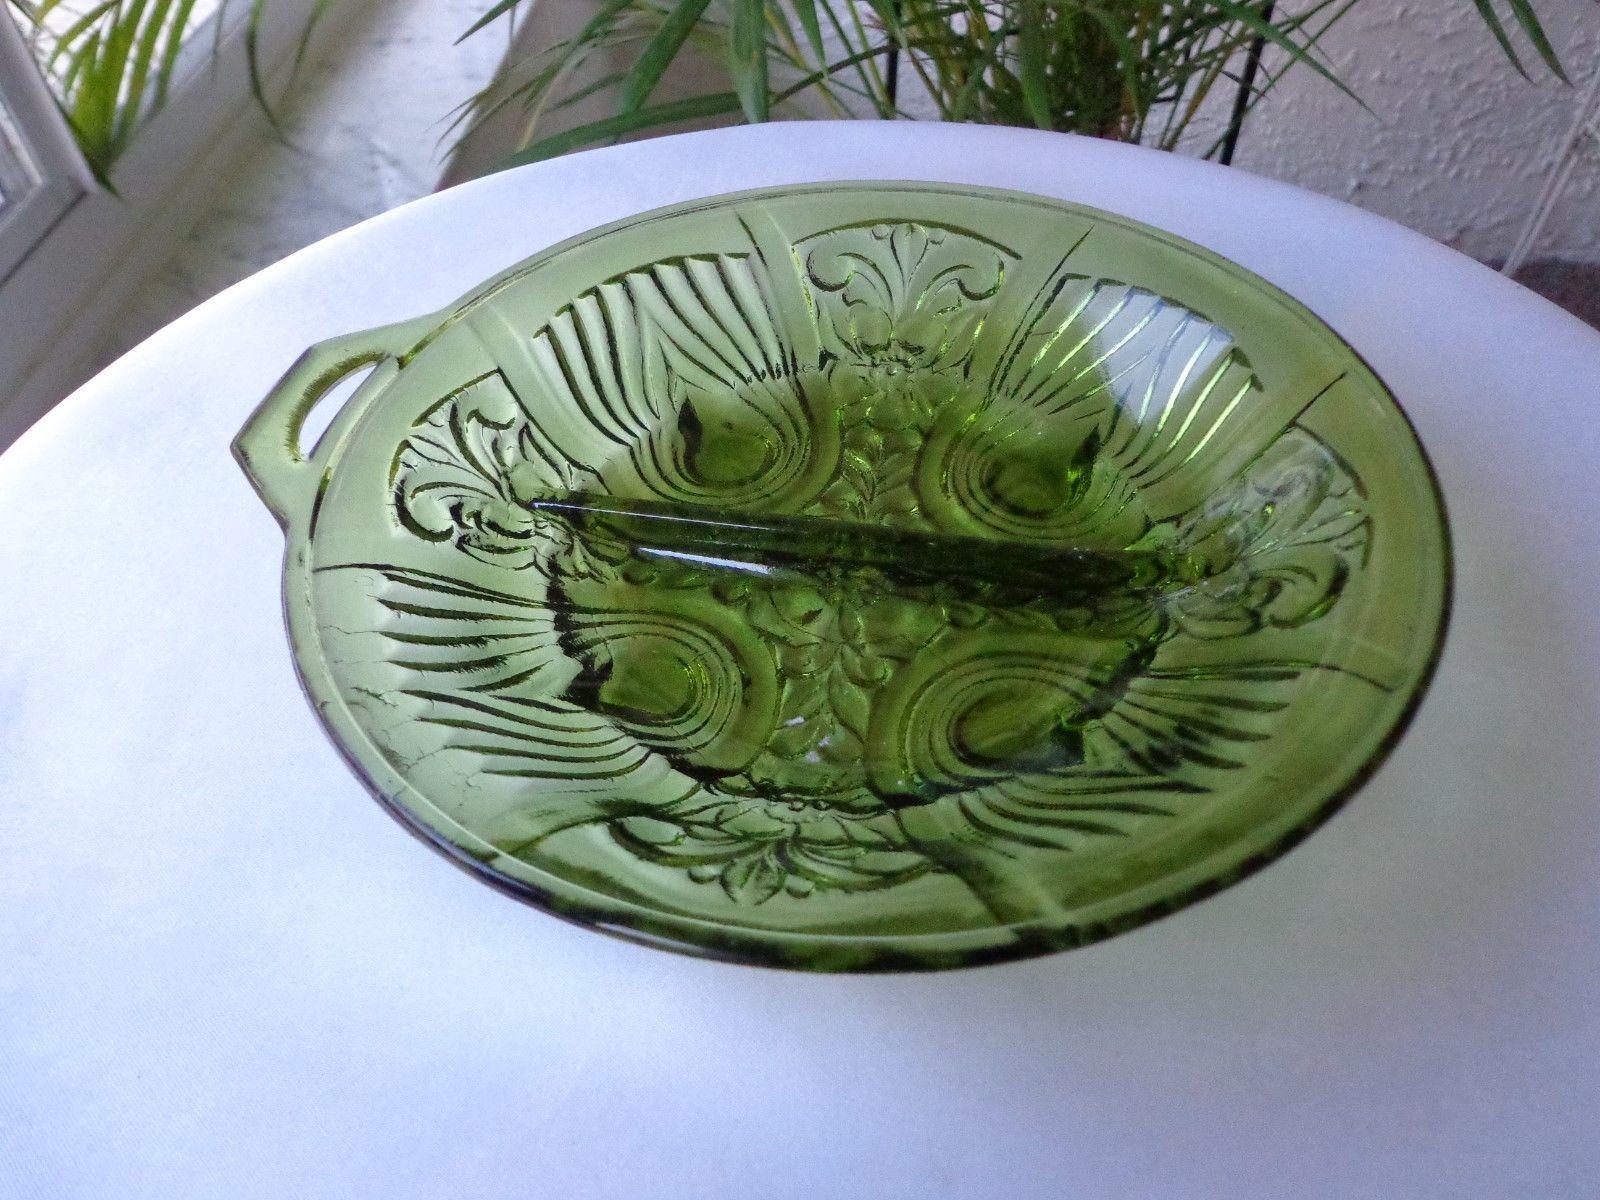 Indiana Glass Killarney Green 2 Part Relish Dish